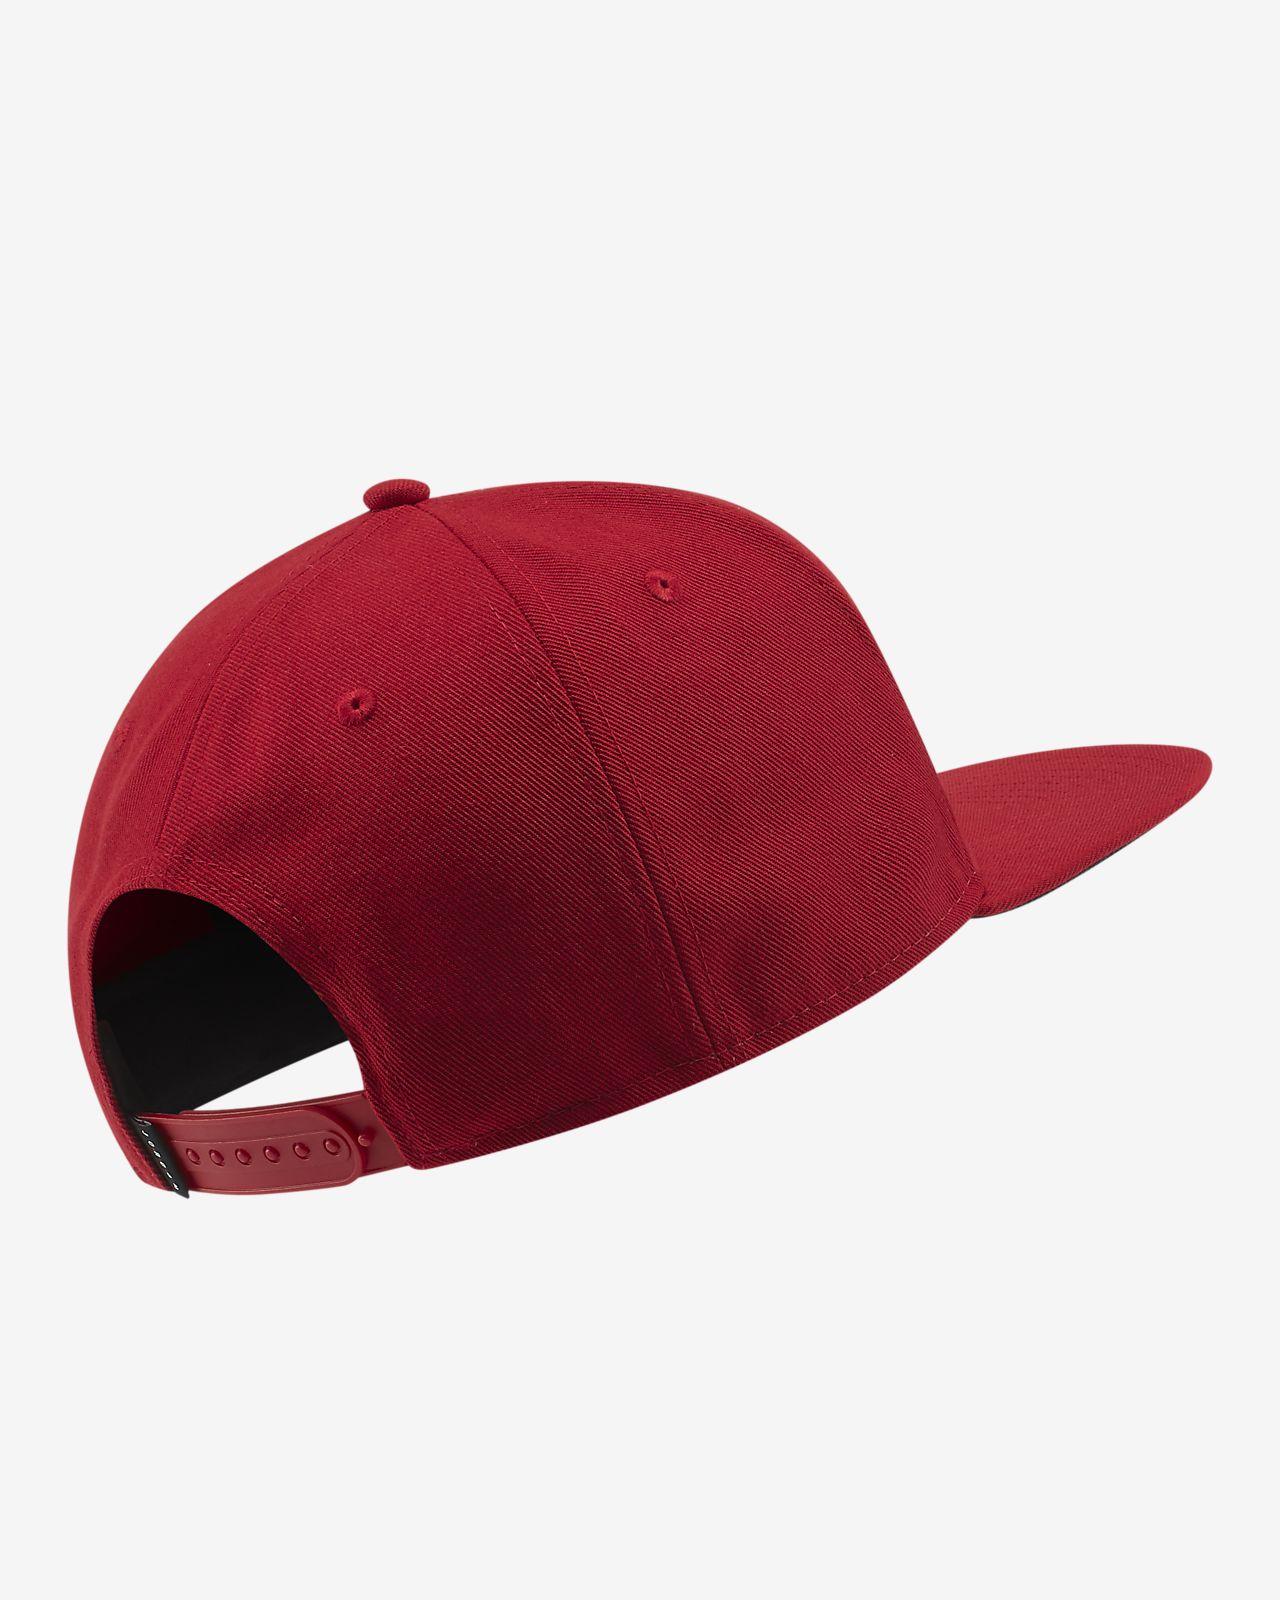 8c9648ae Jordan Pro Jumpman Snapback Hat. Nike.com AU